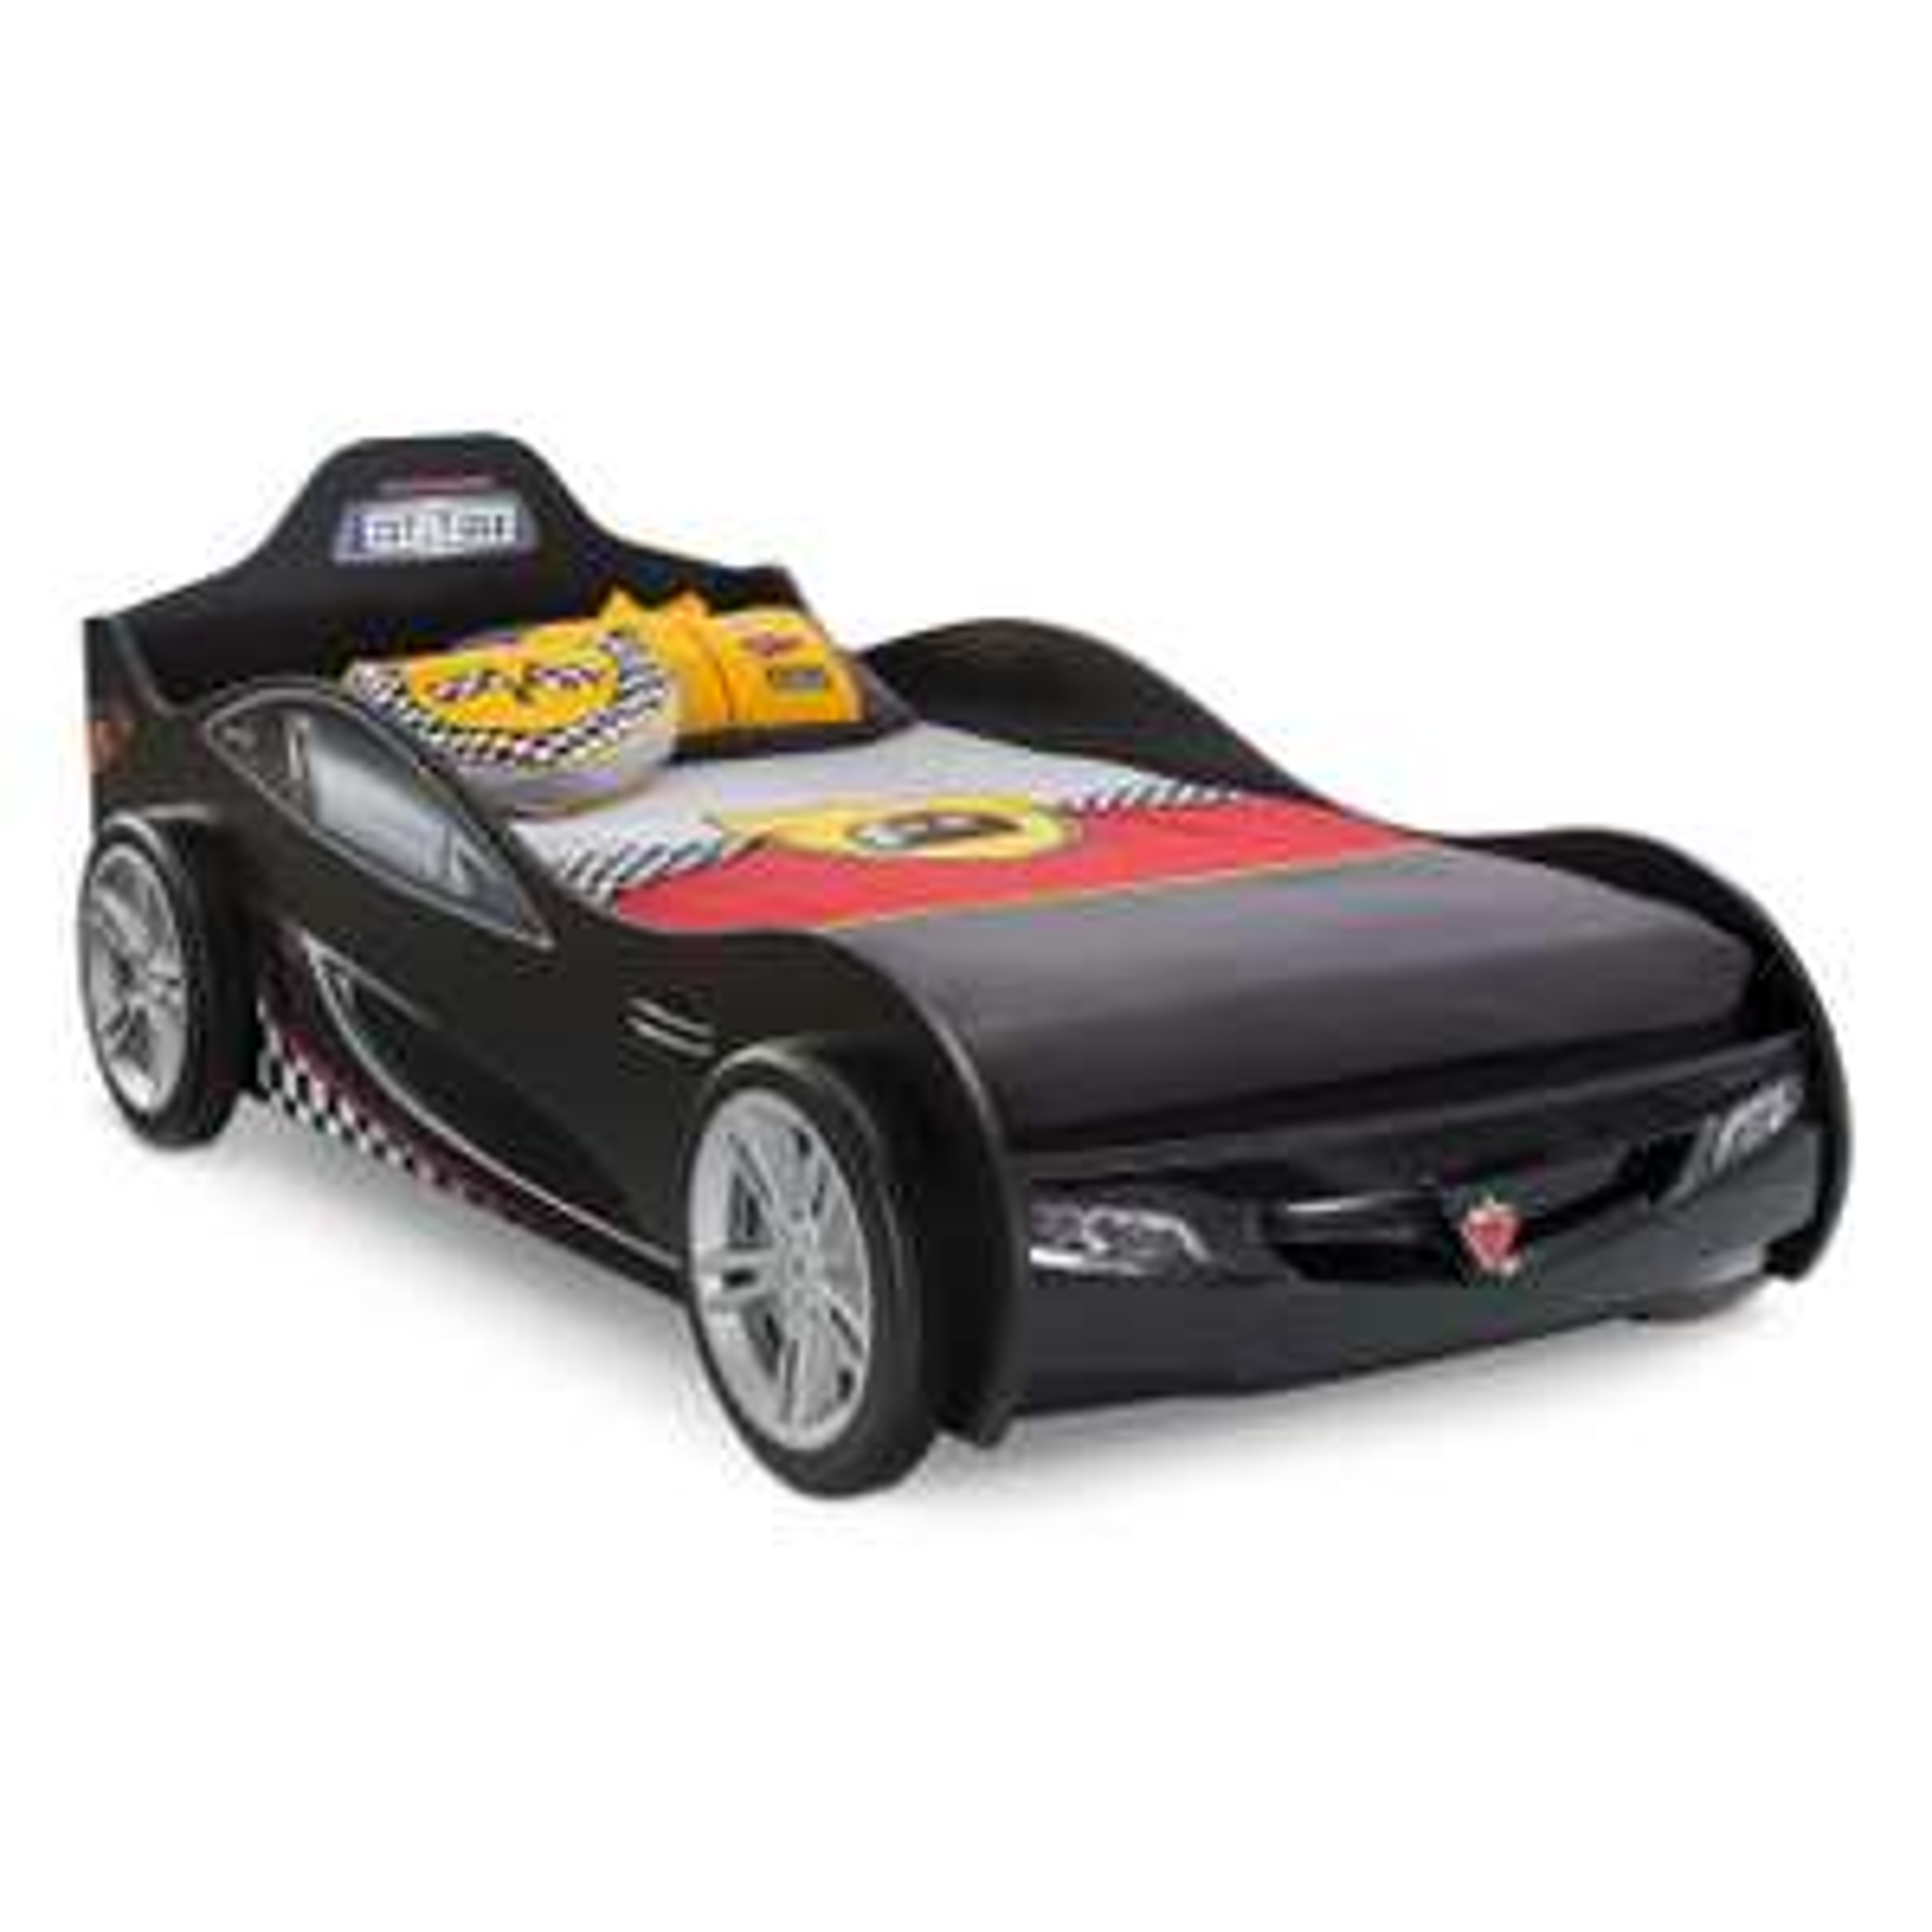 "Kinder-Autobett ""Coupe"" in schwarz inkl. Versand [SEGMÜLLER]"